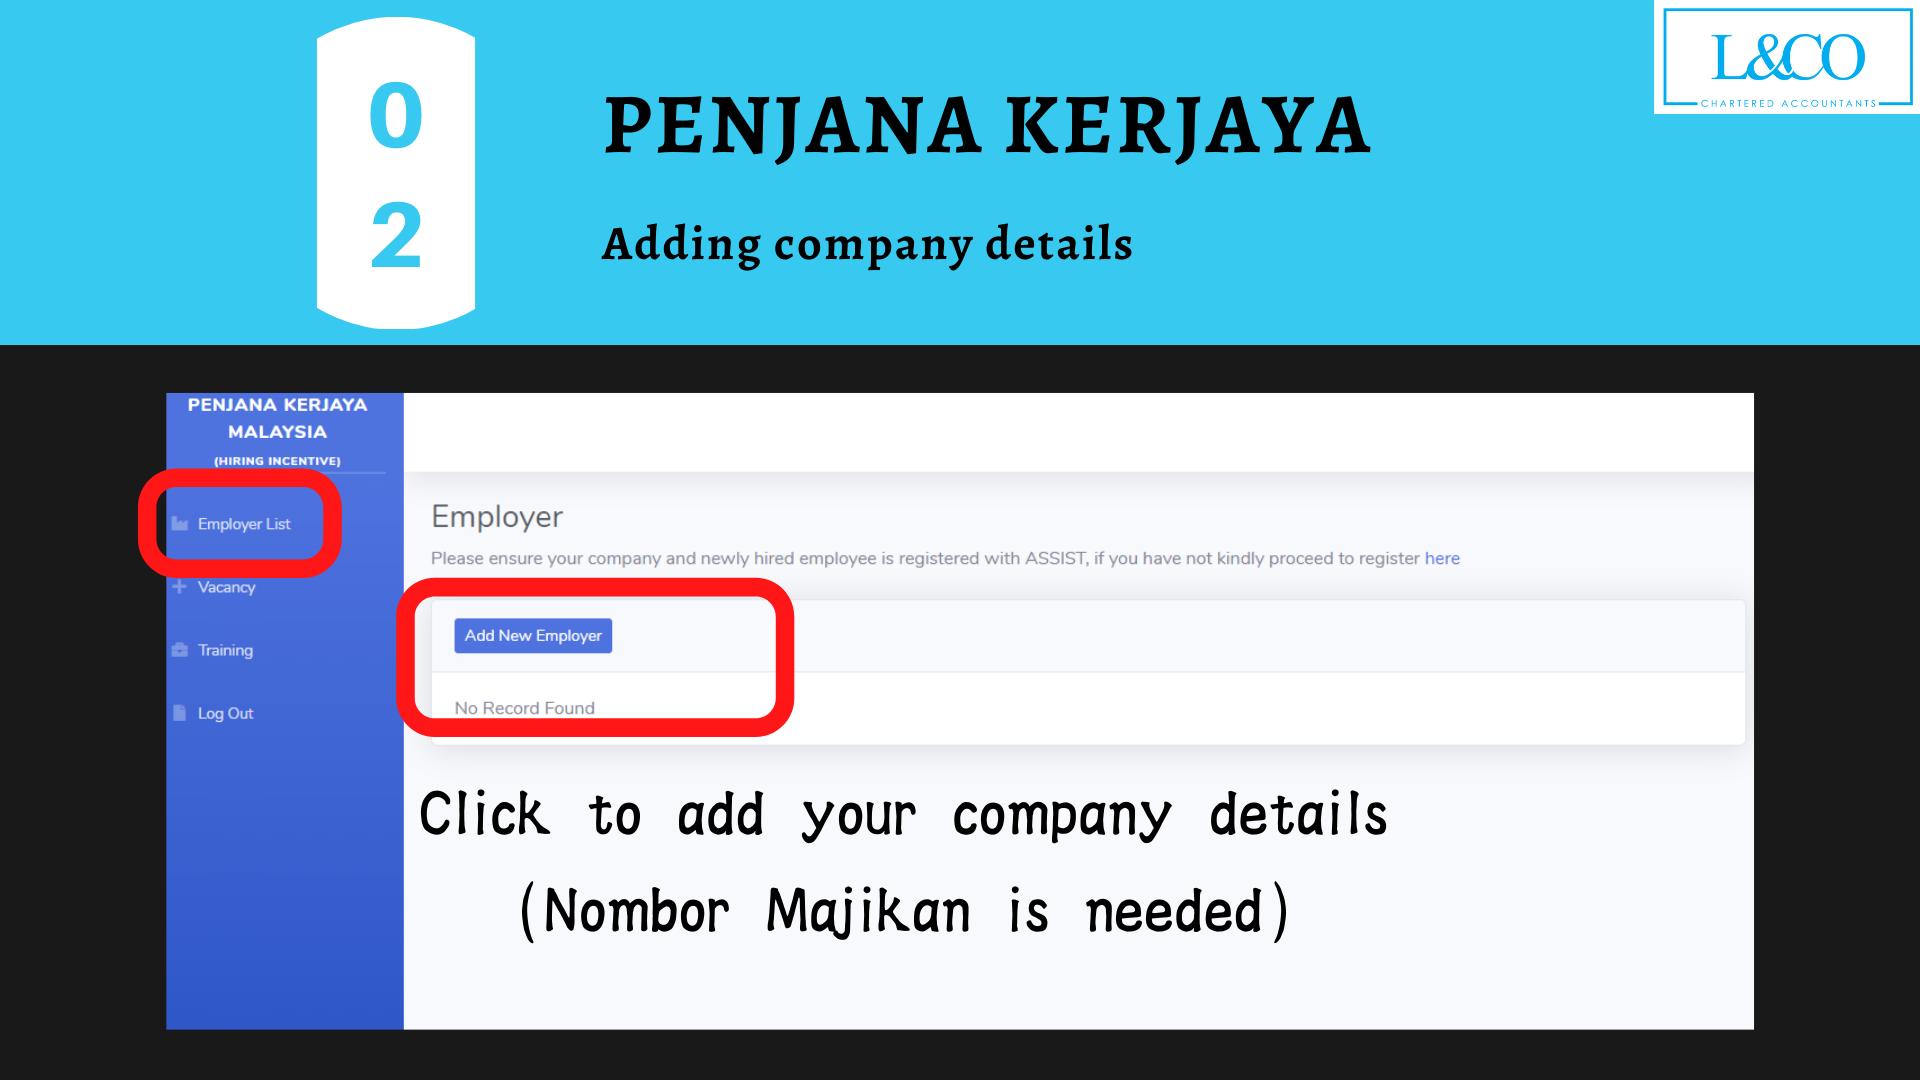 Penjana Kerjaya company details